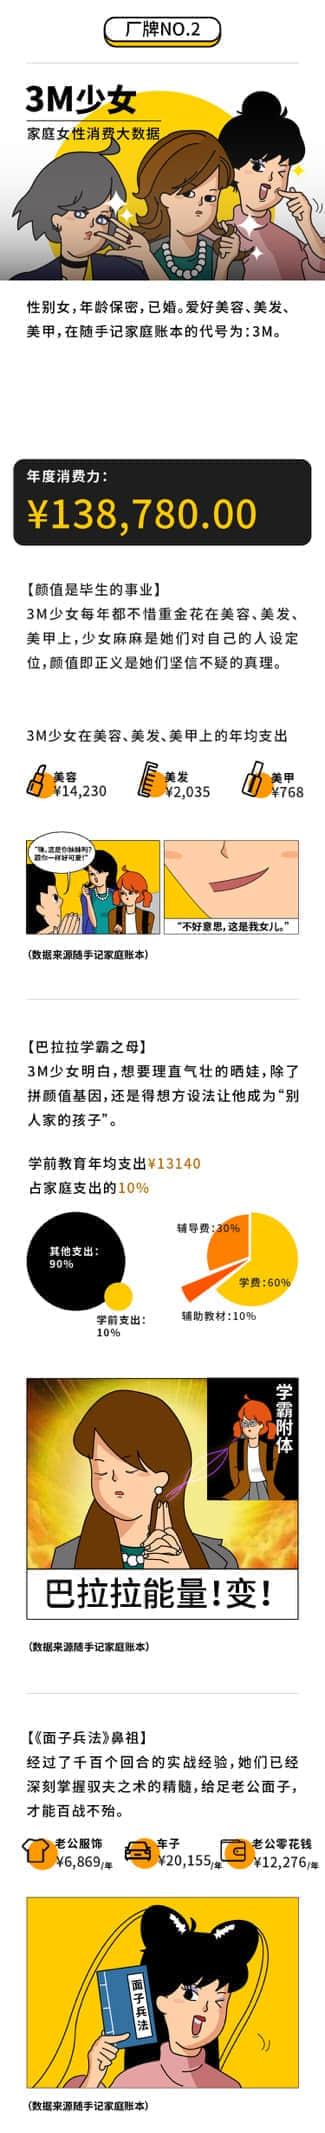 /Users/shaojuanhuang/Desktop/大数据报告V2/厂牌/厂牌-02-3M少女.jpeg